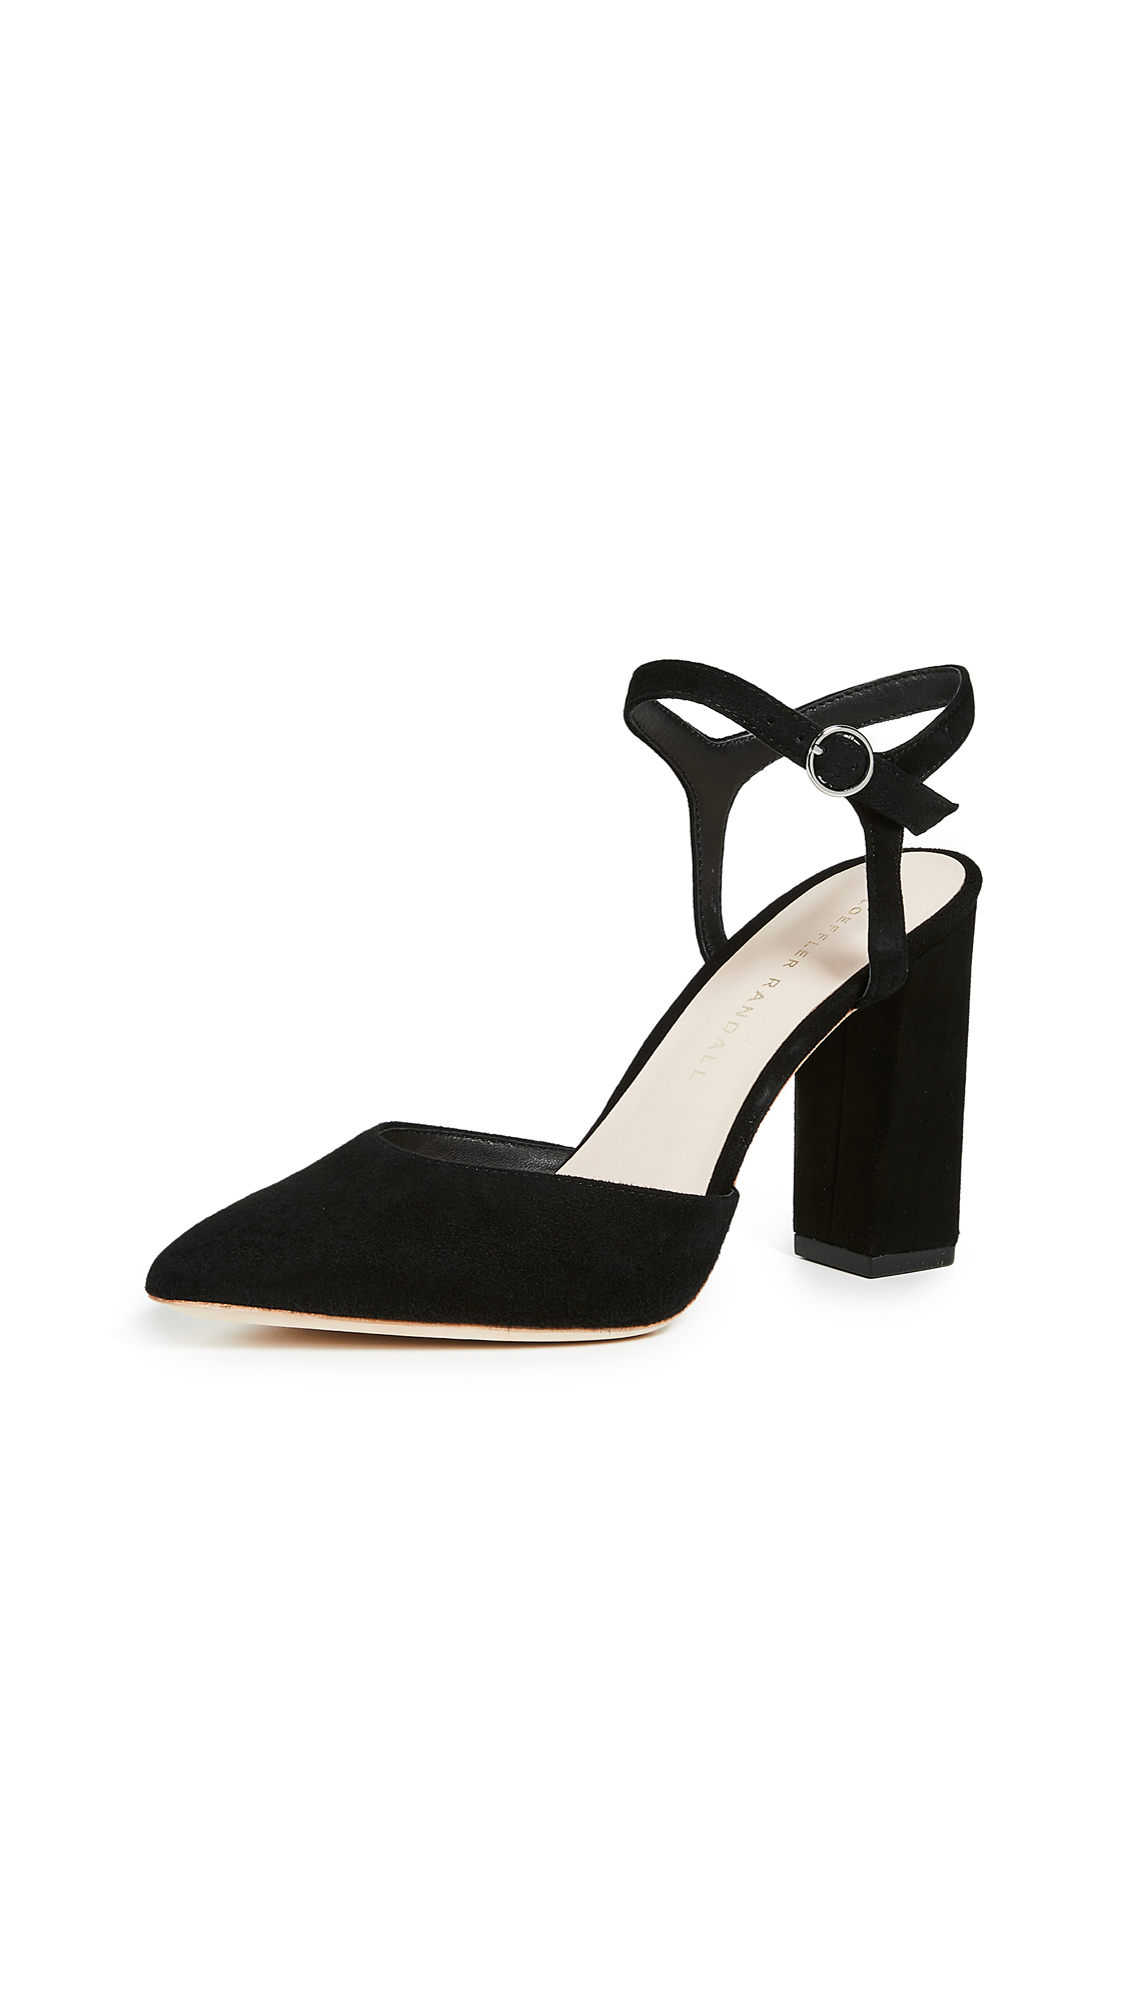 Loeffler Randall Leily Ankle Strap Pumps - Black